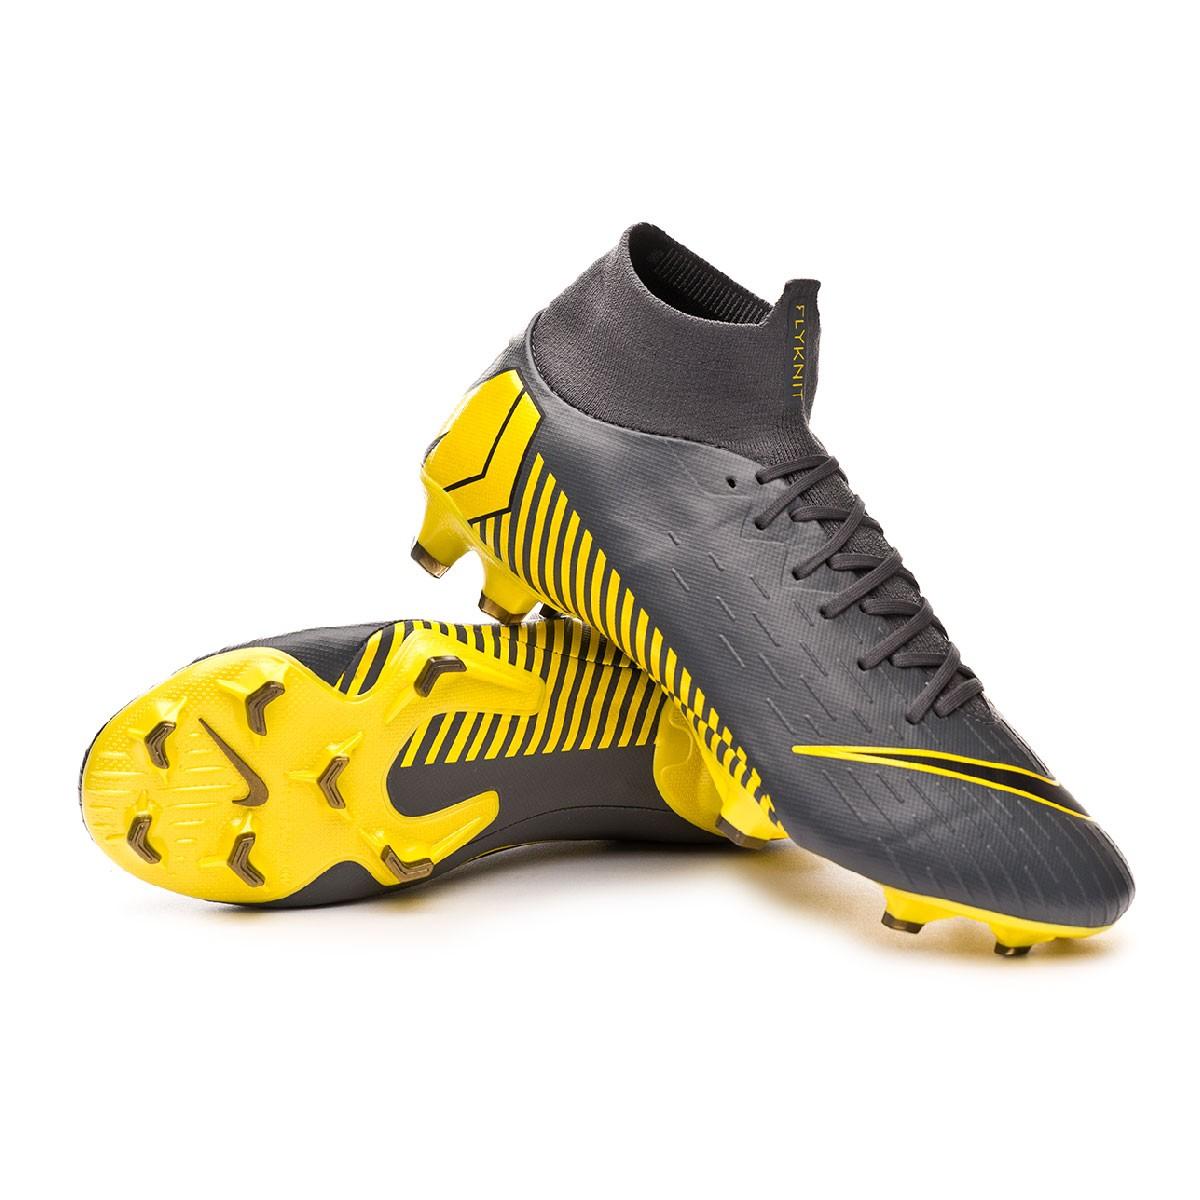 49e057c65 Football Boots Nike Mercurial Superfly VI Pro FG Dark grey-Black-Optical  yellow - Football store Fútbol Emotion